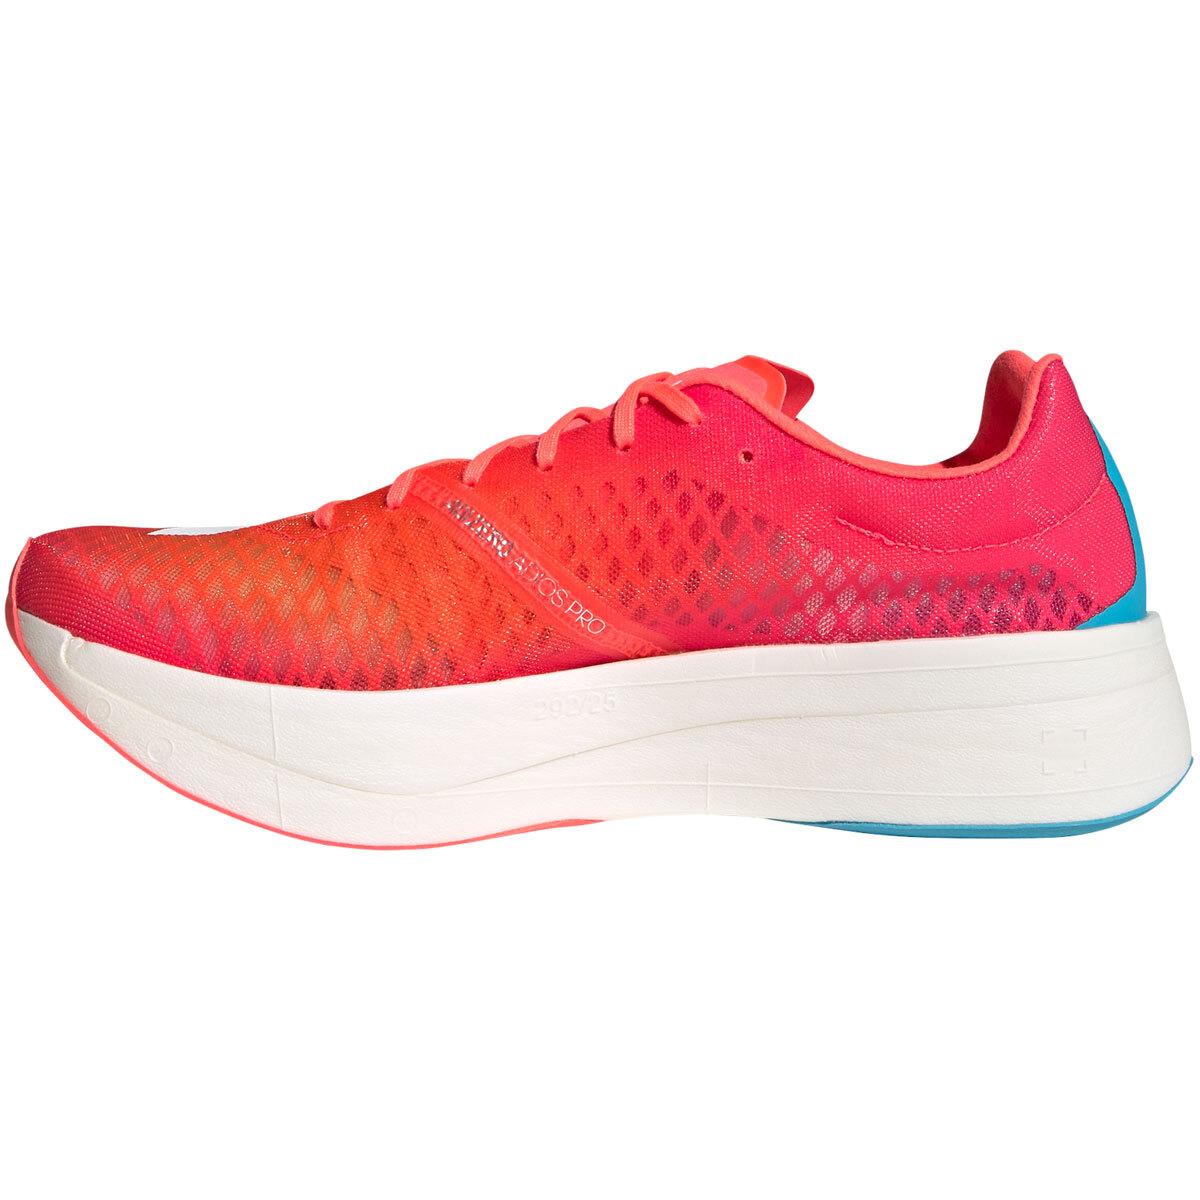 Adidas Adizero Adios Pro Running Shoe - Color: Signal Pink/Cloud White/Shock Pink - Size: M4/W5.5 - Width: Regular, Signal Pink/Cloud White/Shock Pink, large, image 3